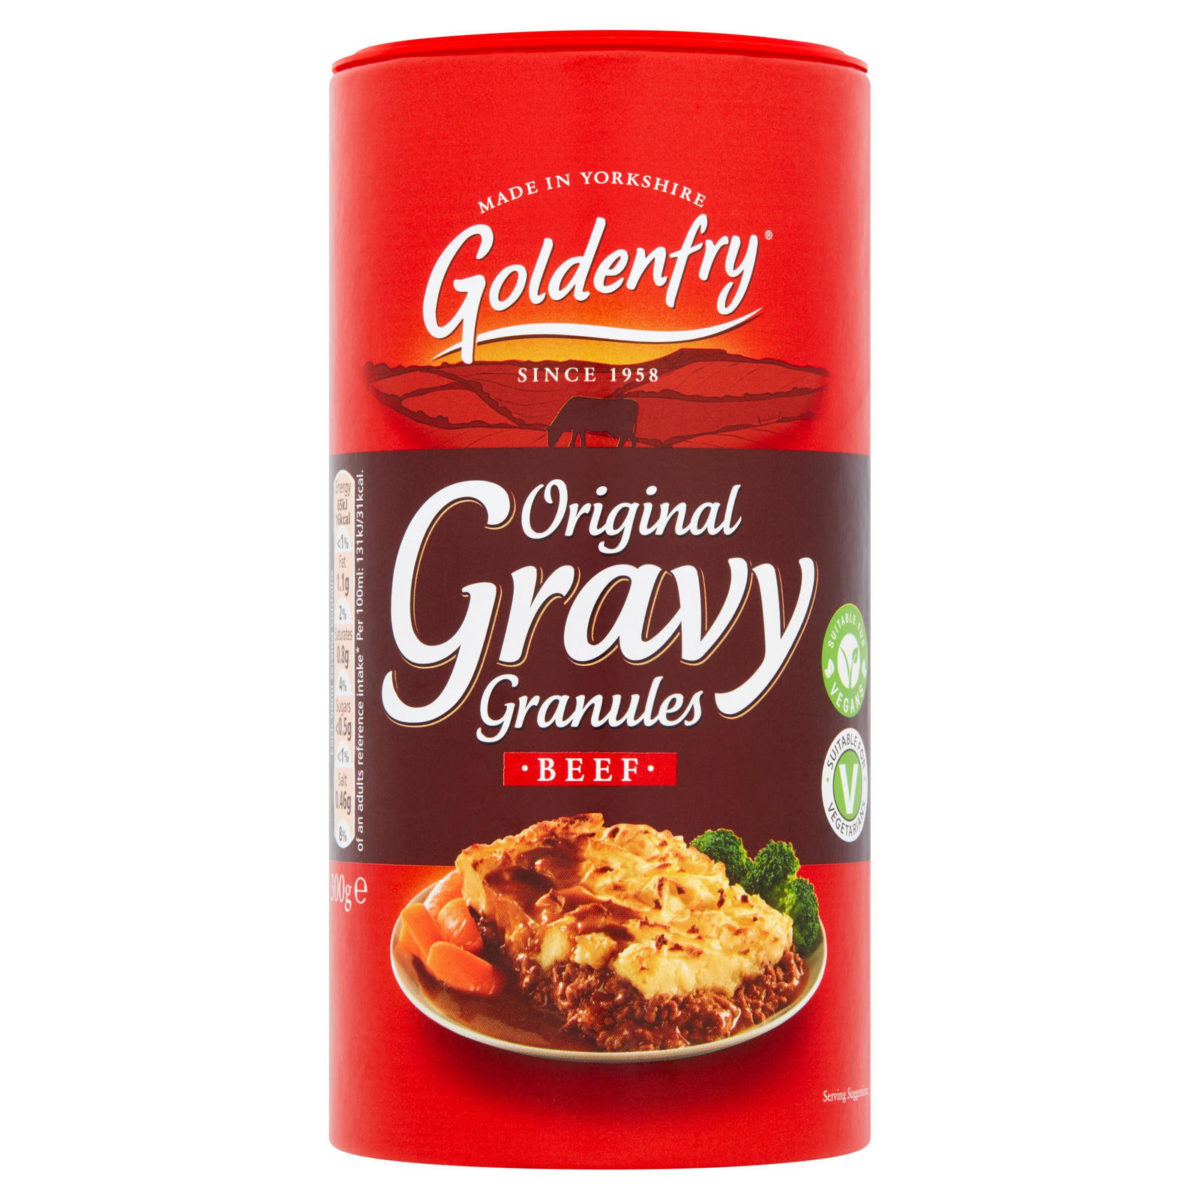 goldenfry_original_gravy_granules_beef